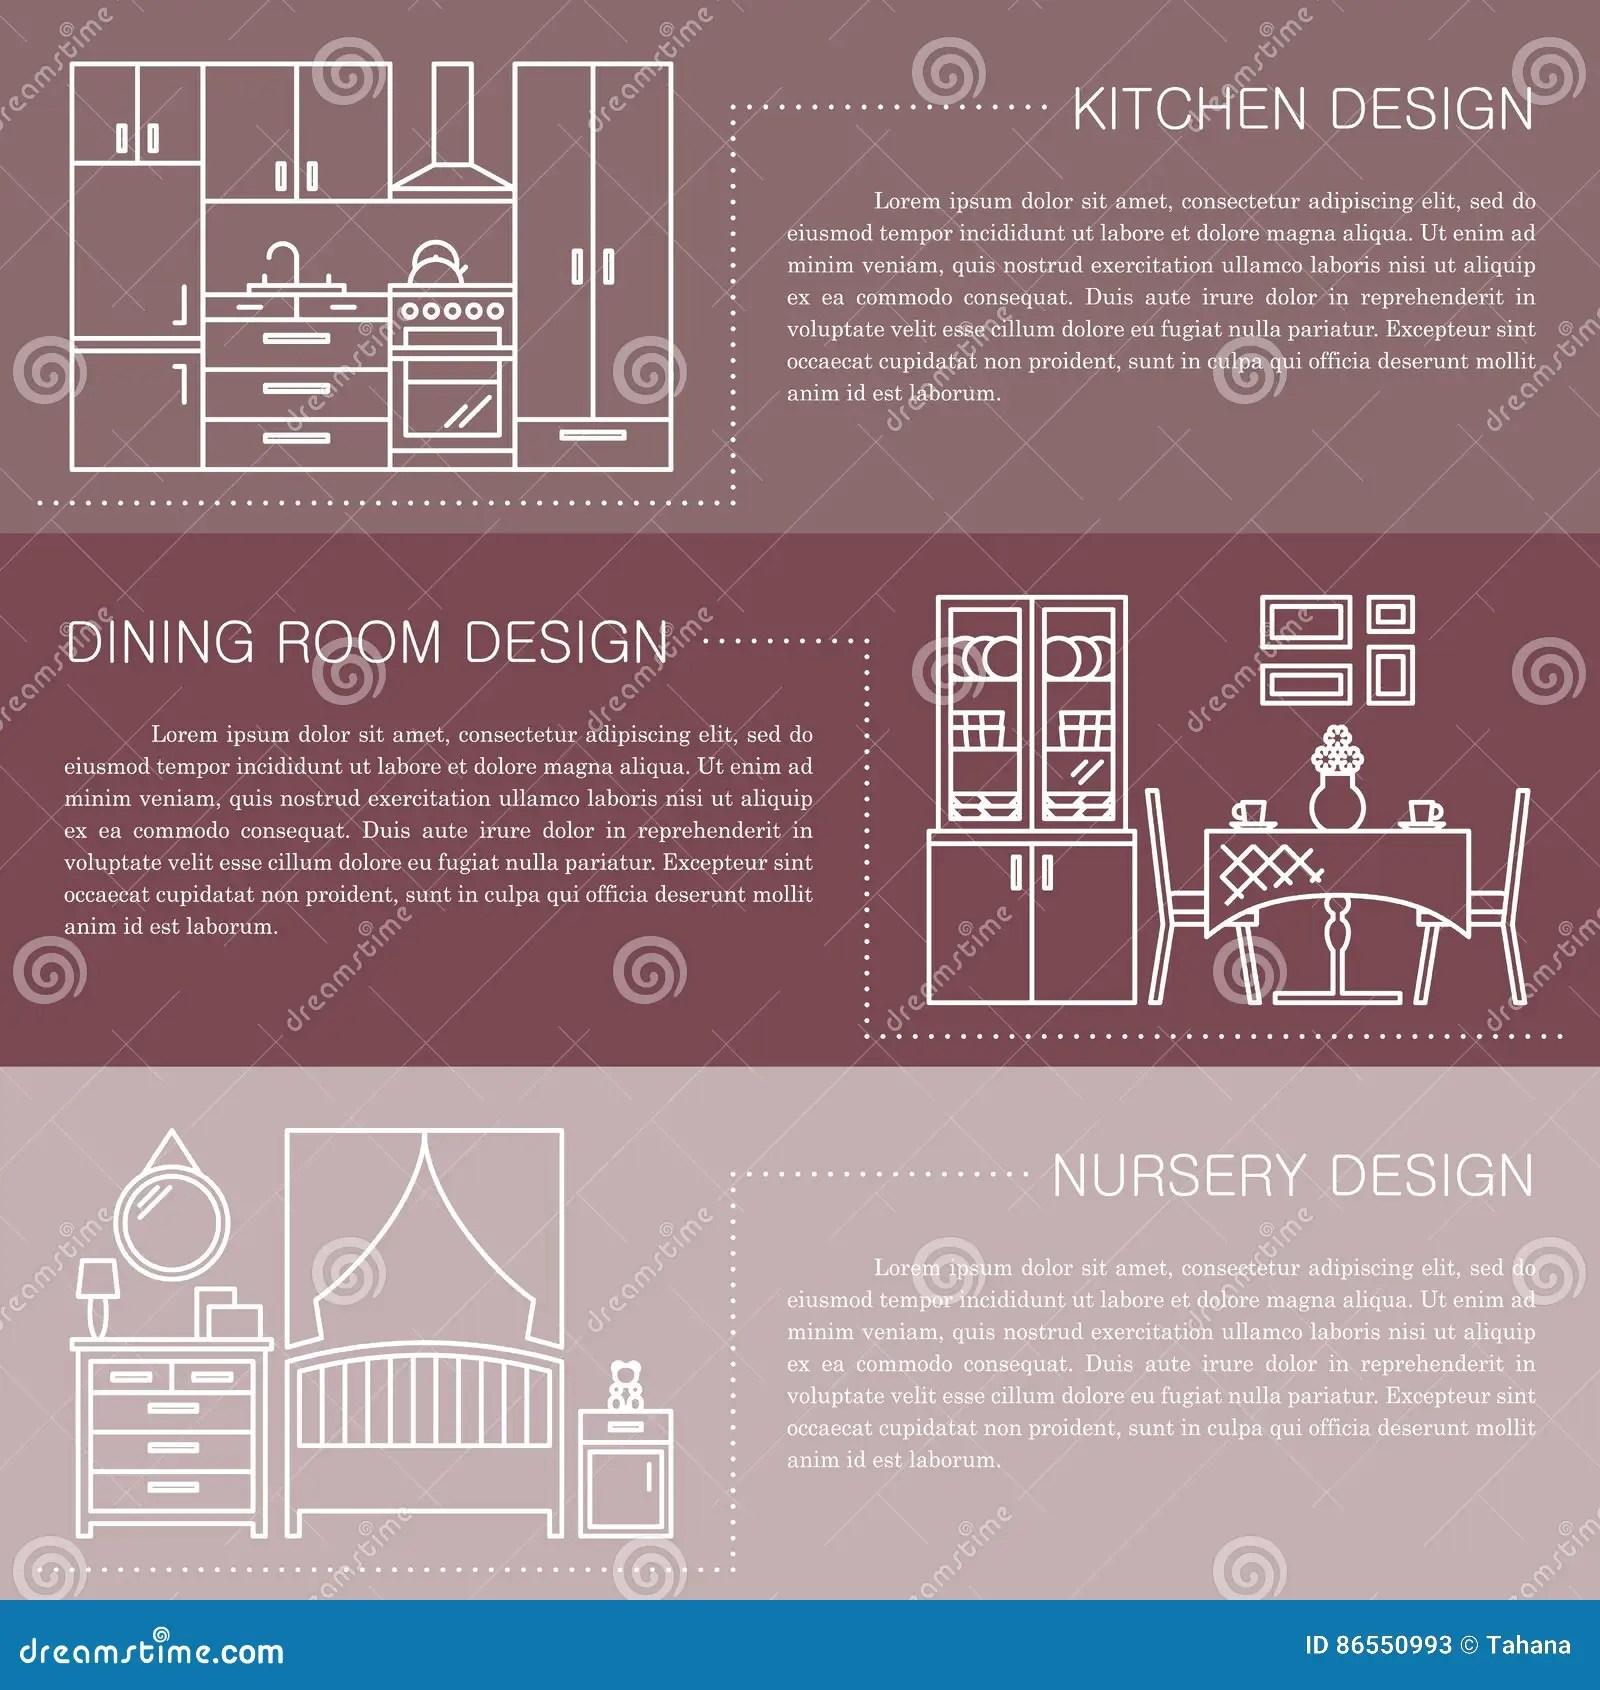 kitchen design template metal shelves ikea 与线内部象的现代小册子飞行物设计模板厨房 餐厅 托儿所传染媒介例证